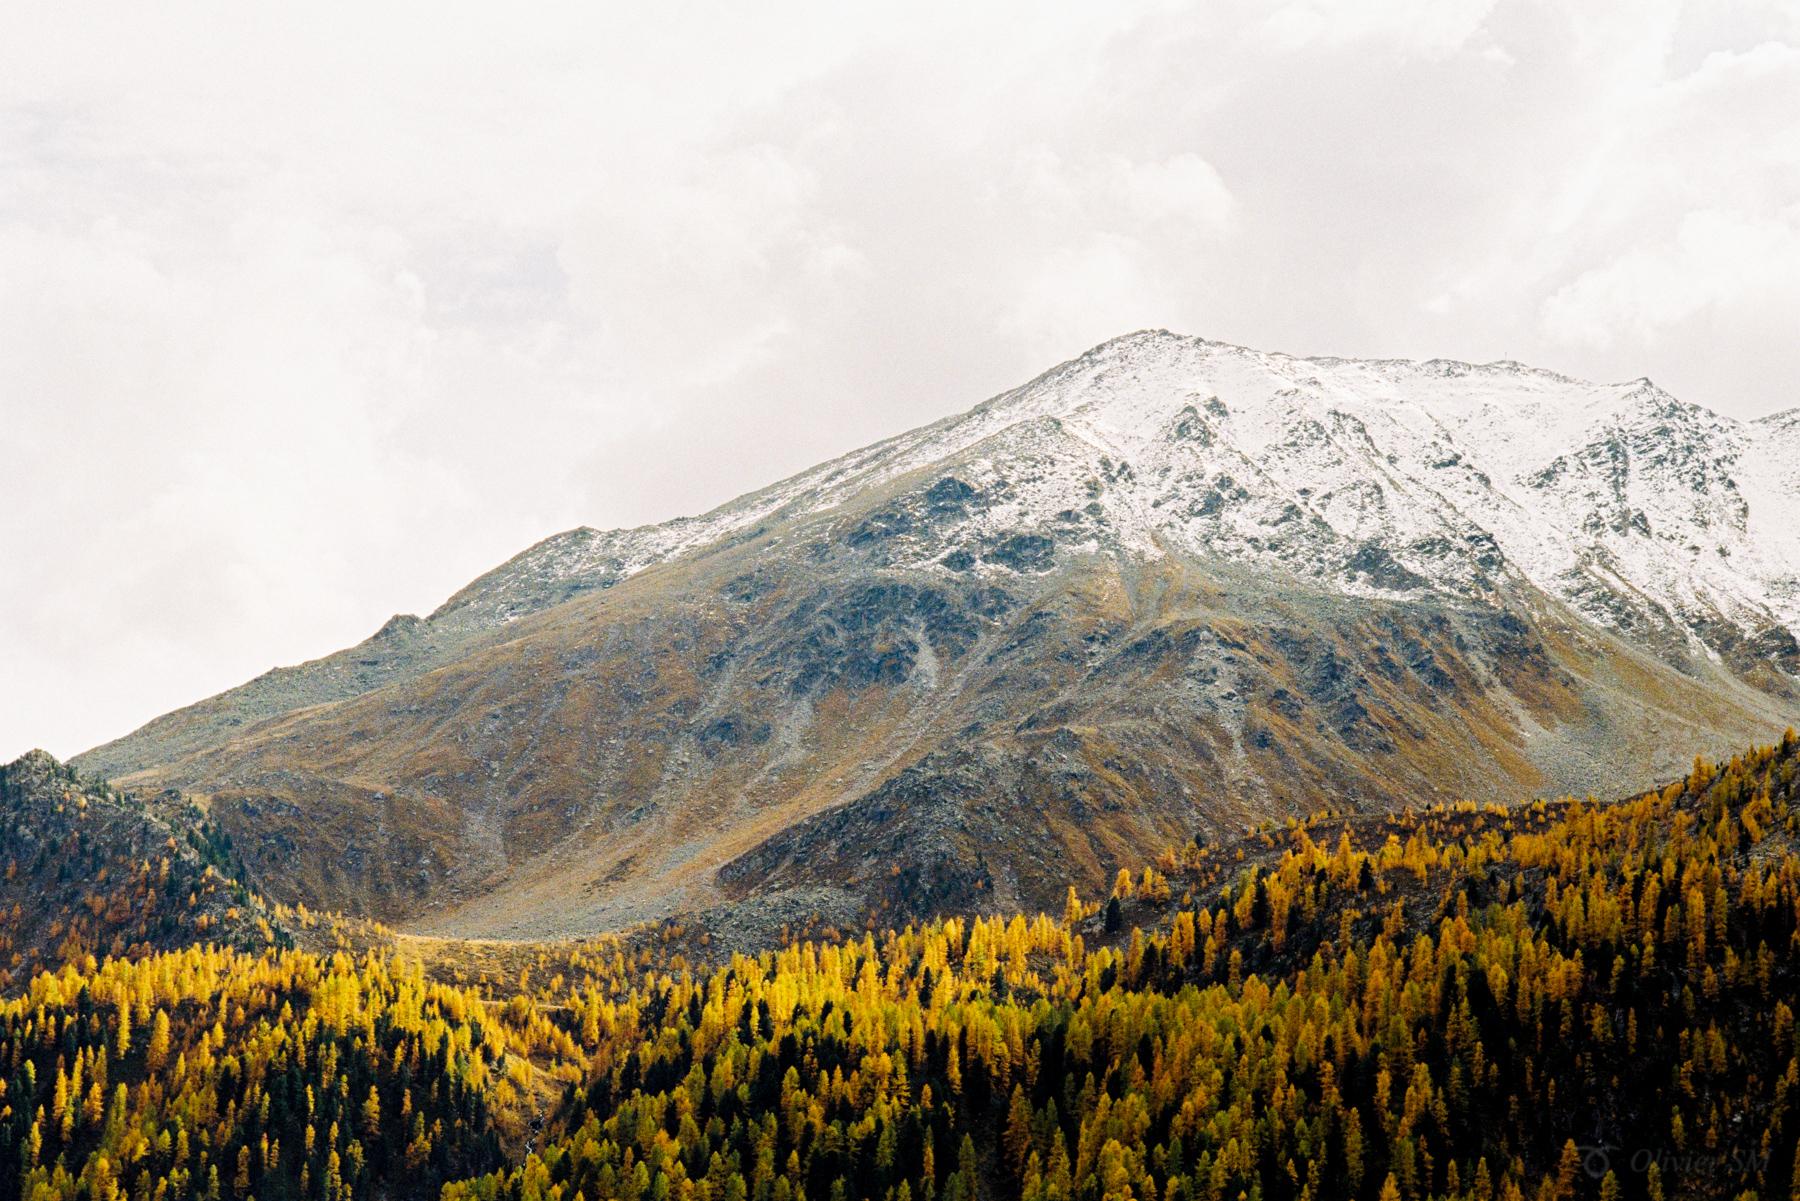 Olivier Meier | Swiss Autumn | Nikon FM3A | Nikkor 50mm f1.2 | Kodak Ultramax 400